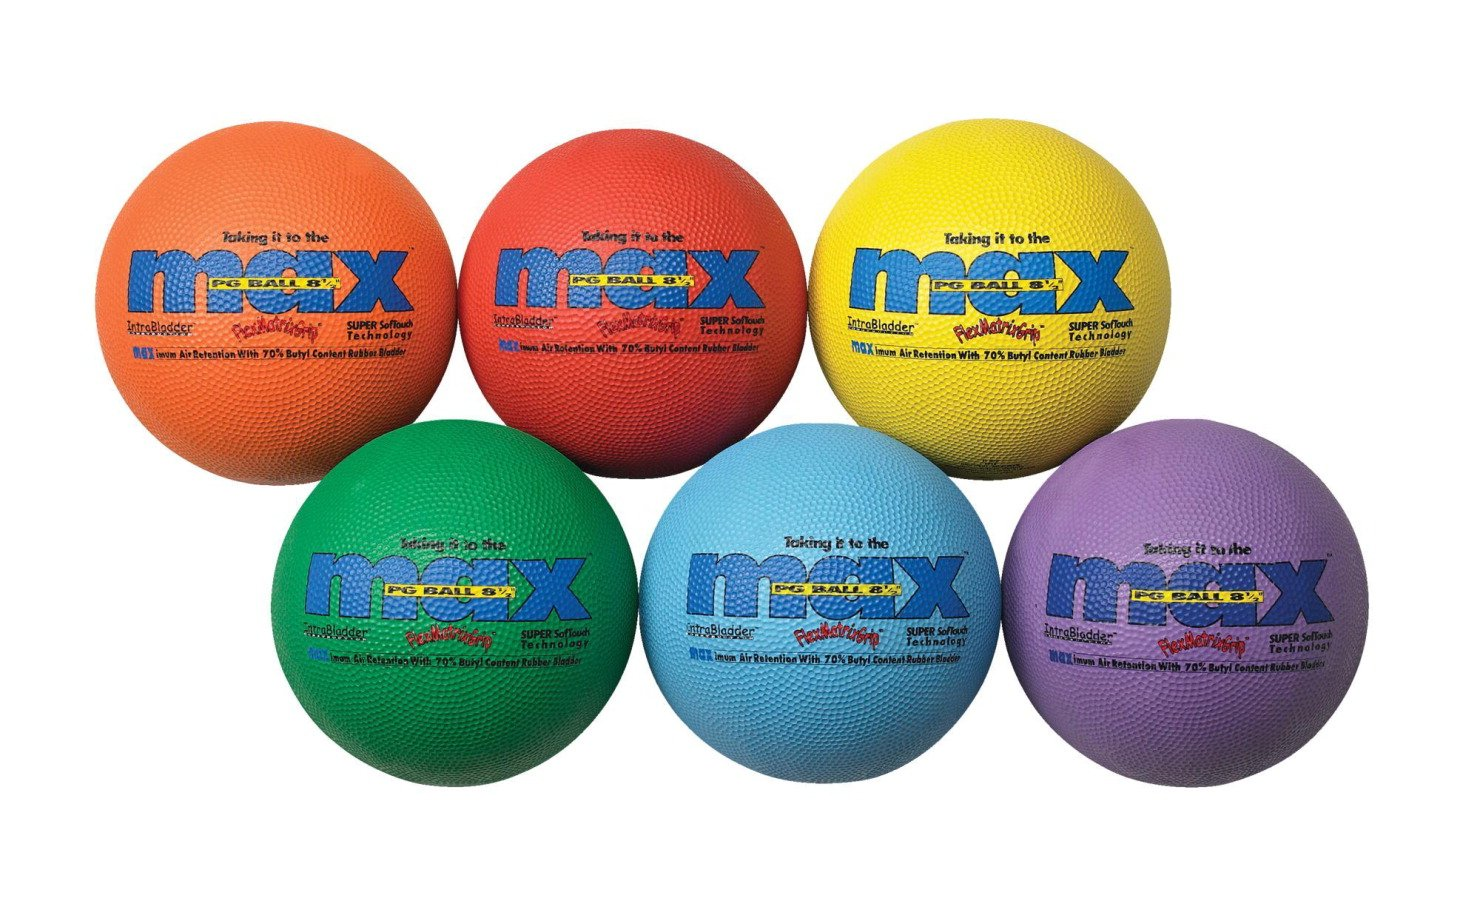 SportimeMax FlexMatrix Playground Balls - 8 1/2 inch - Set of 6 by Sportime